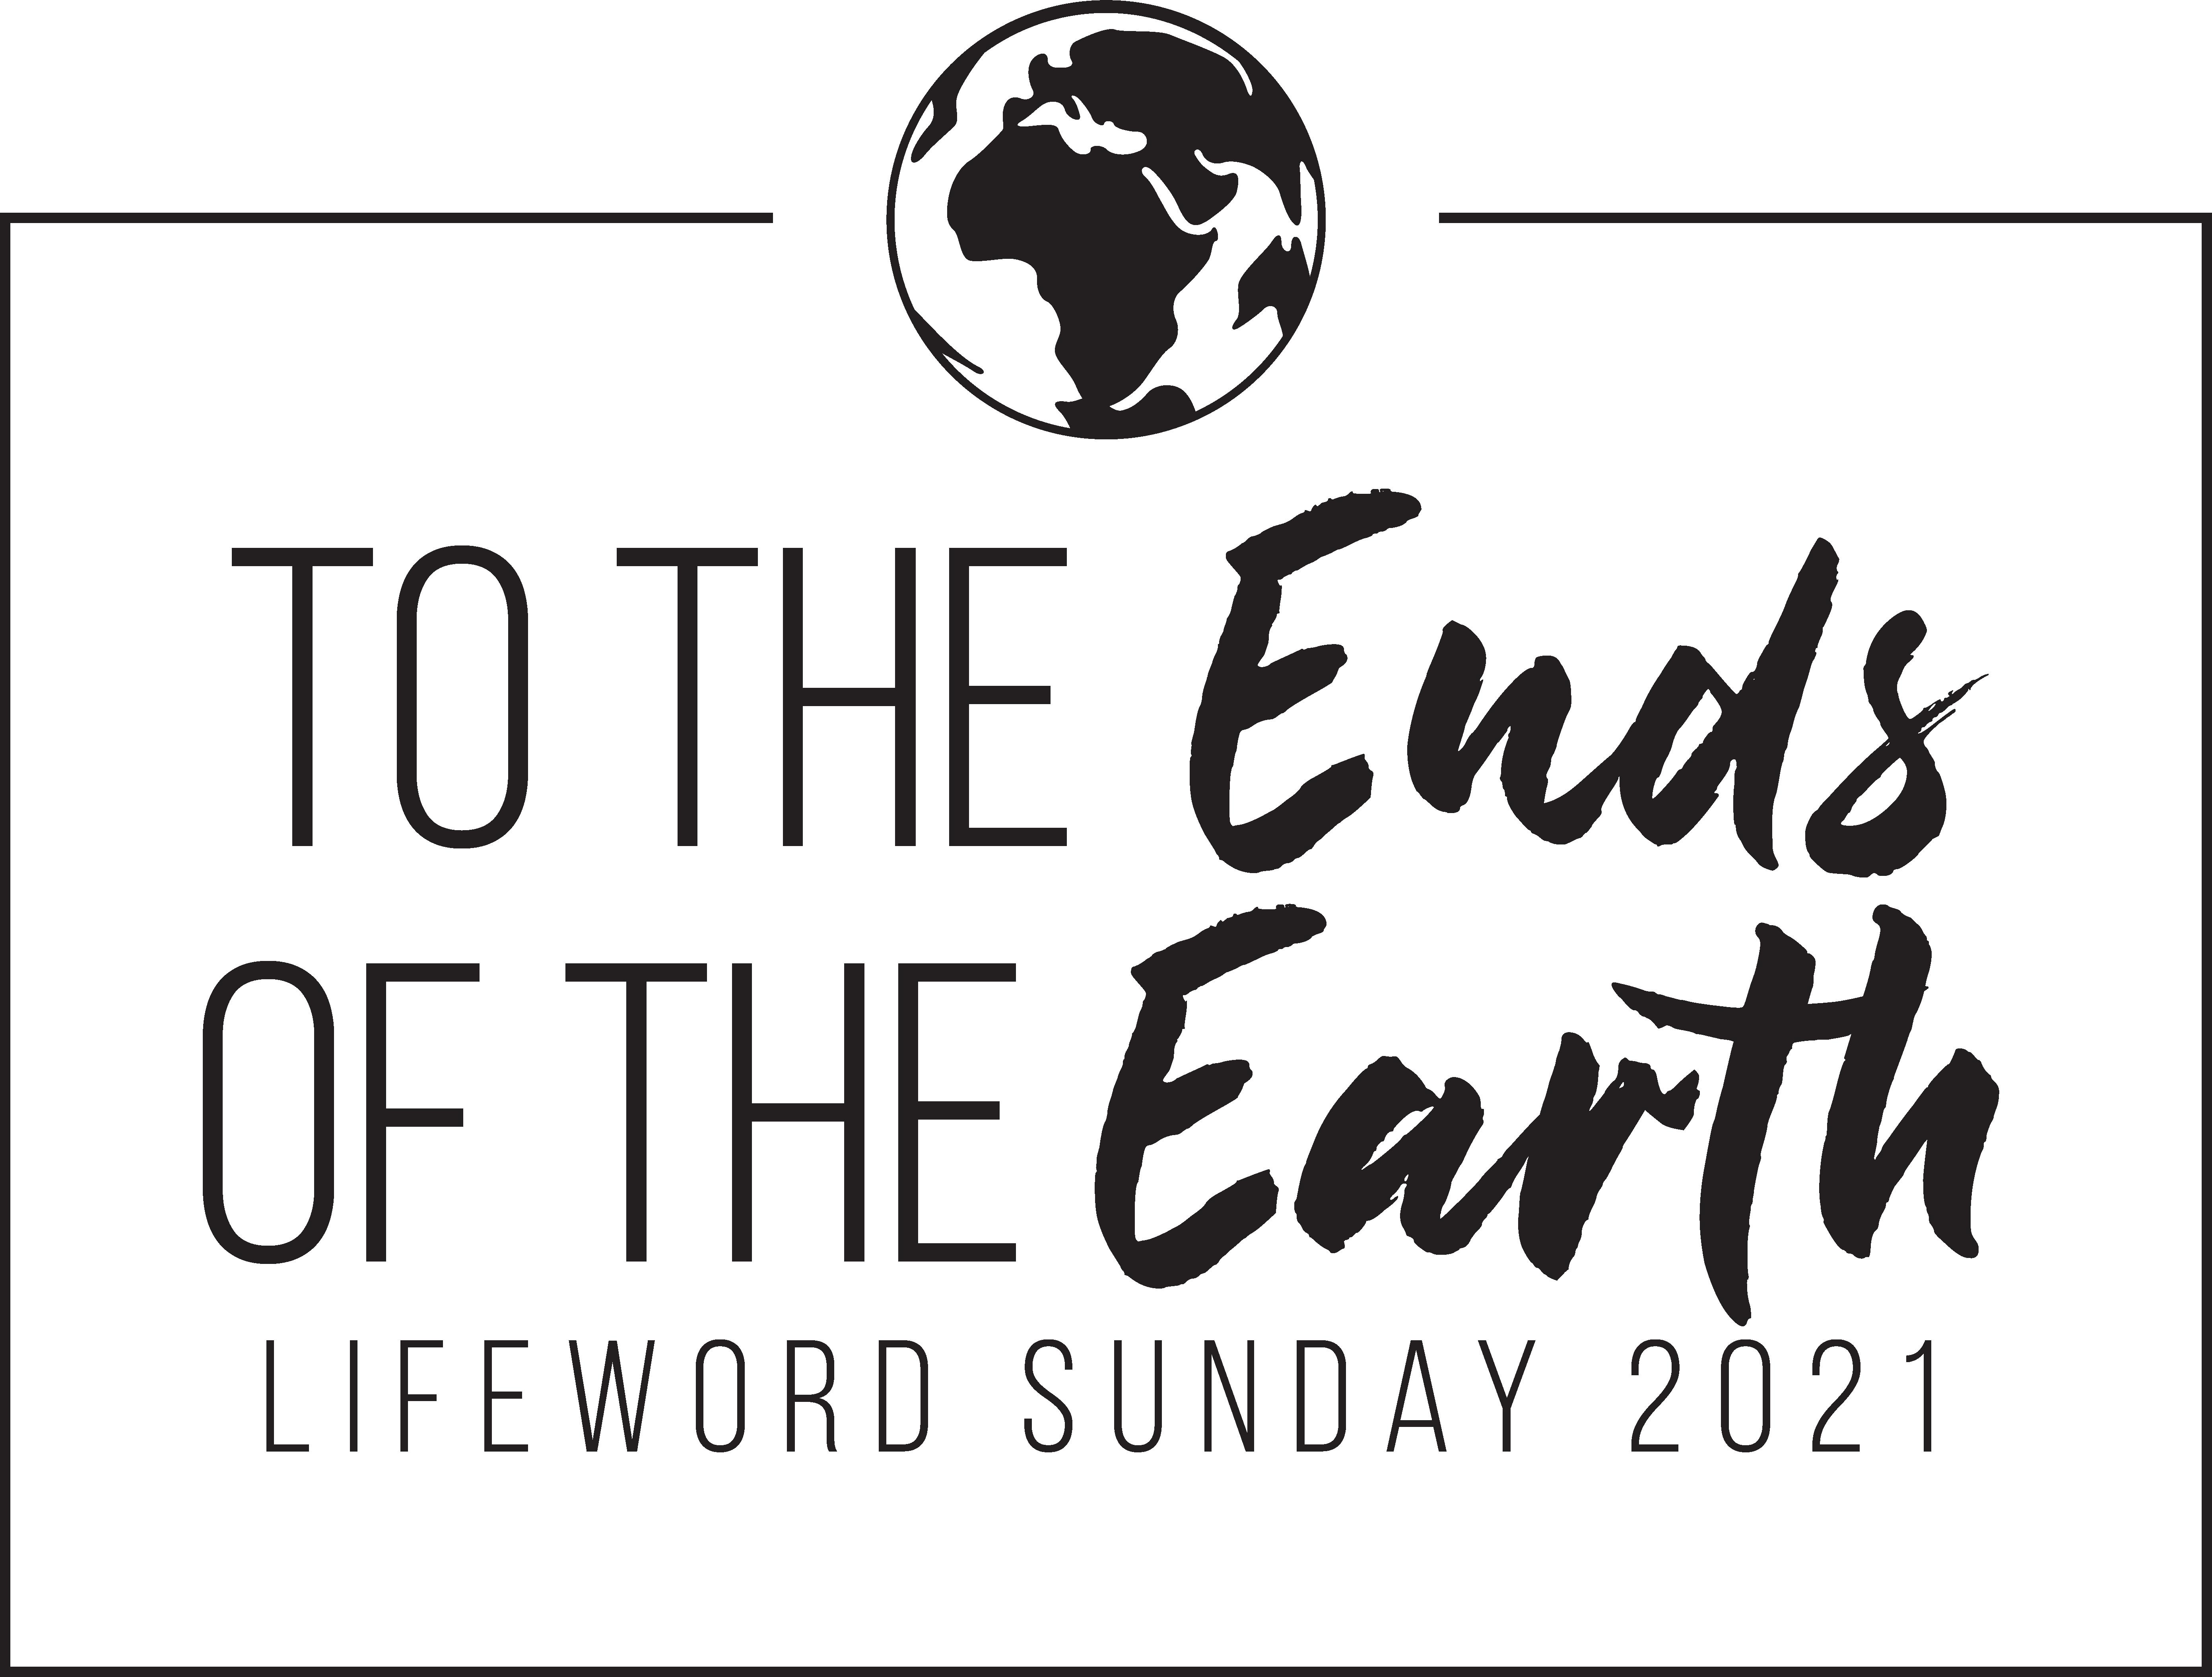 Lifeword Sunday 2021 Logo